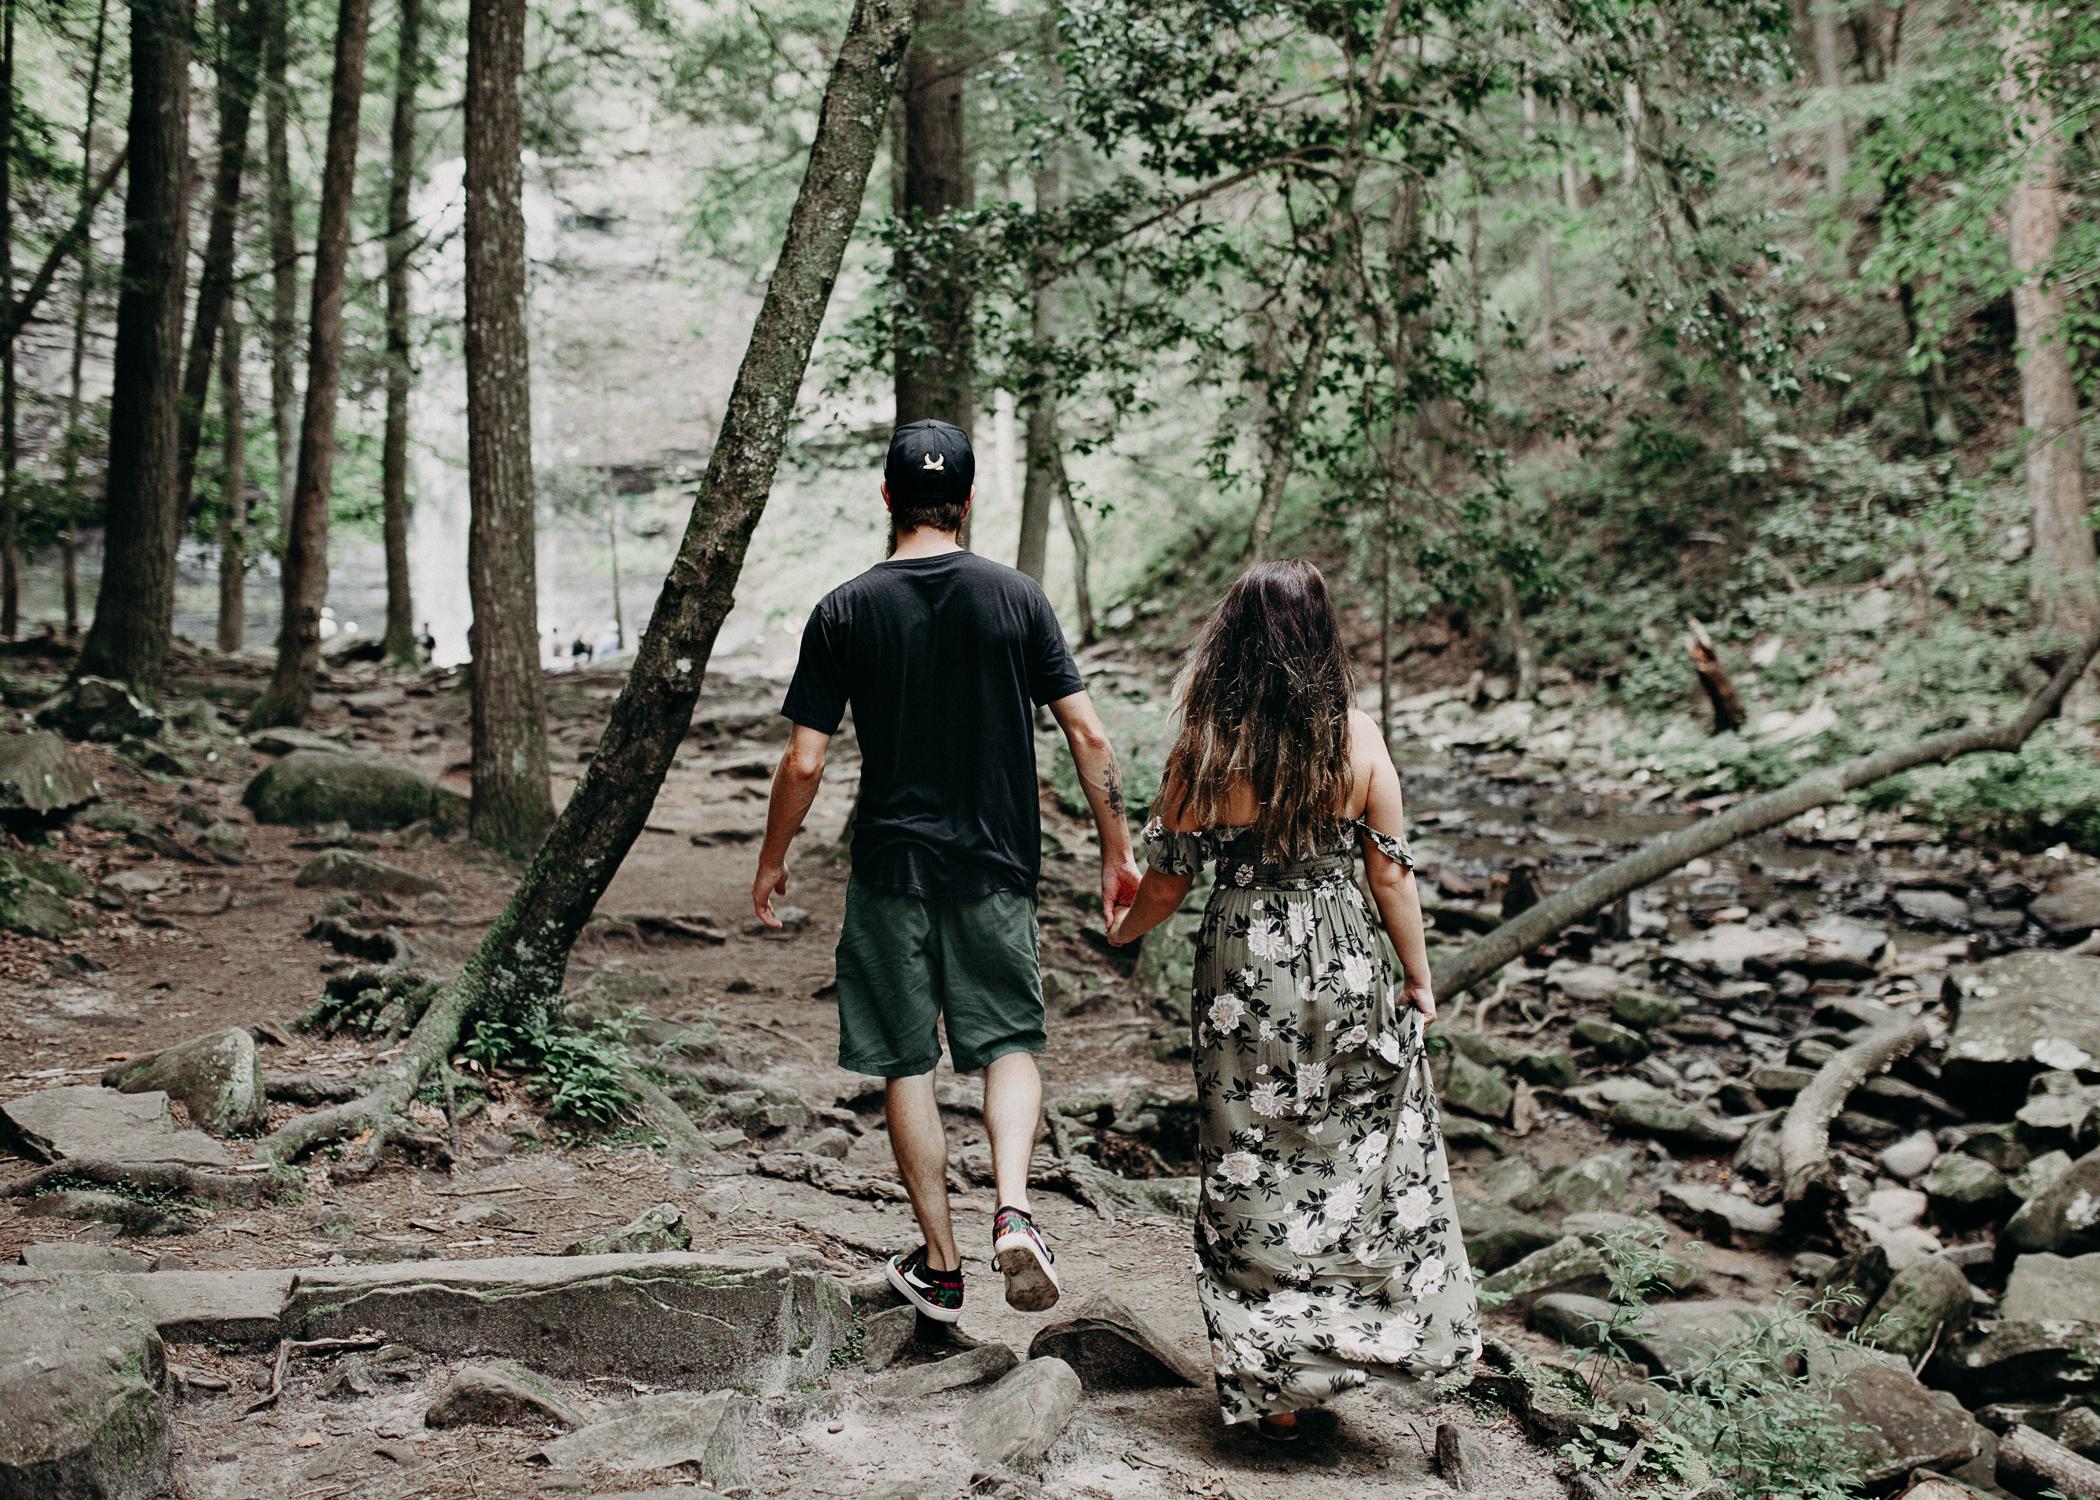 Cloudland canyon, whaterfall georgia, couples waterfall engagement 17.jpg